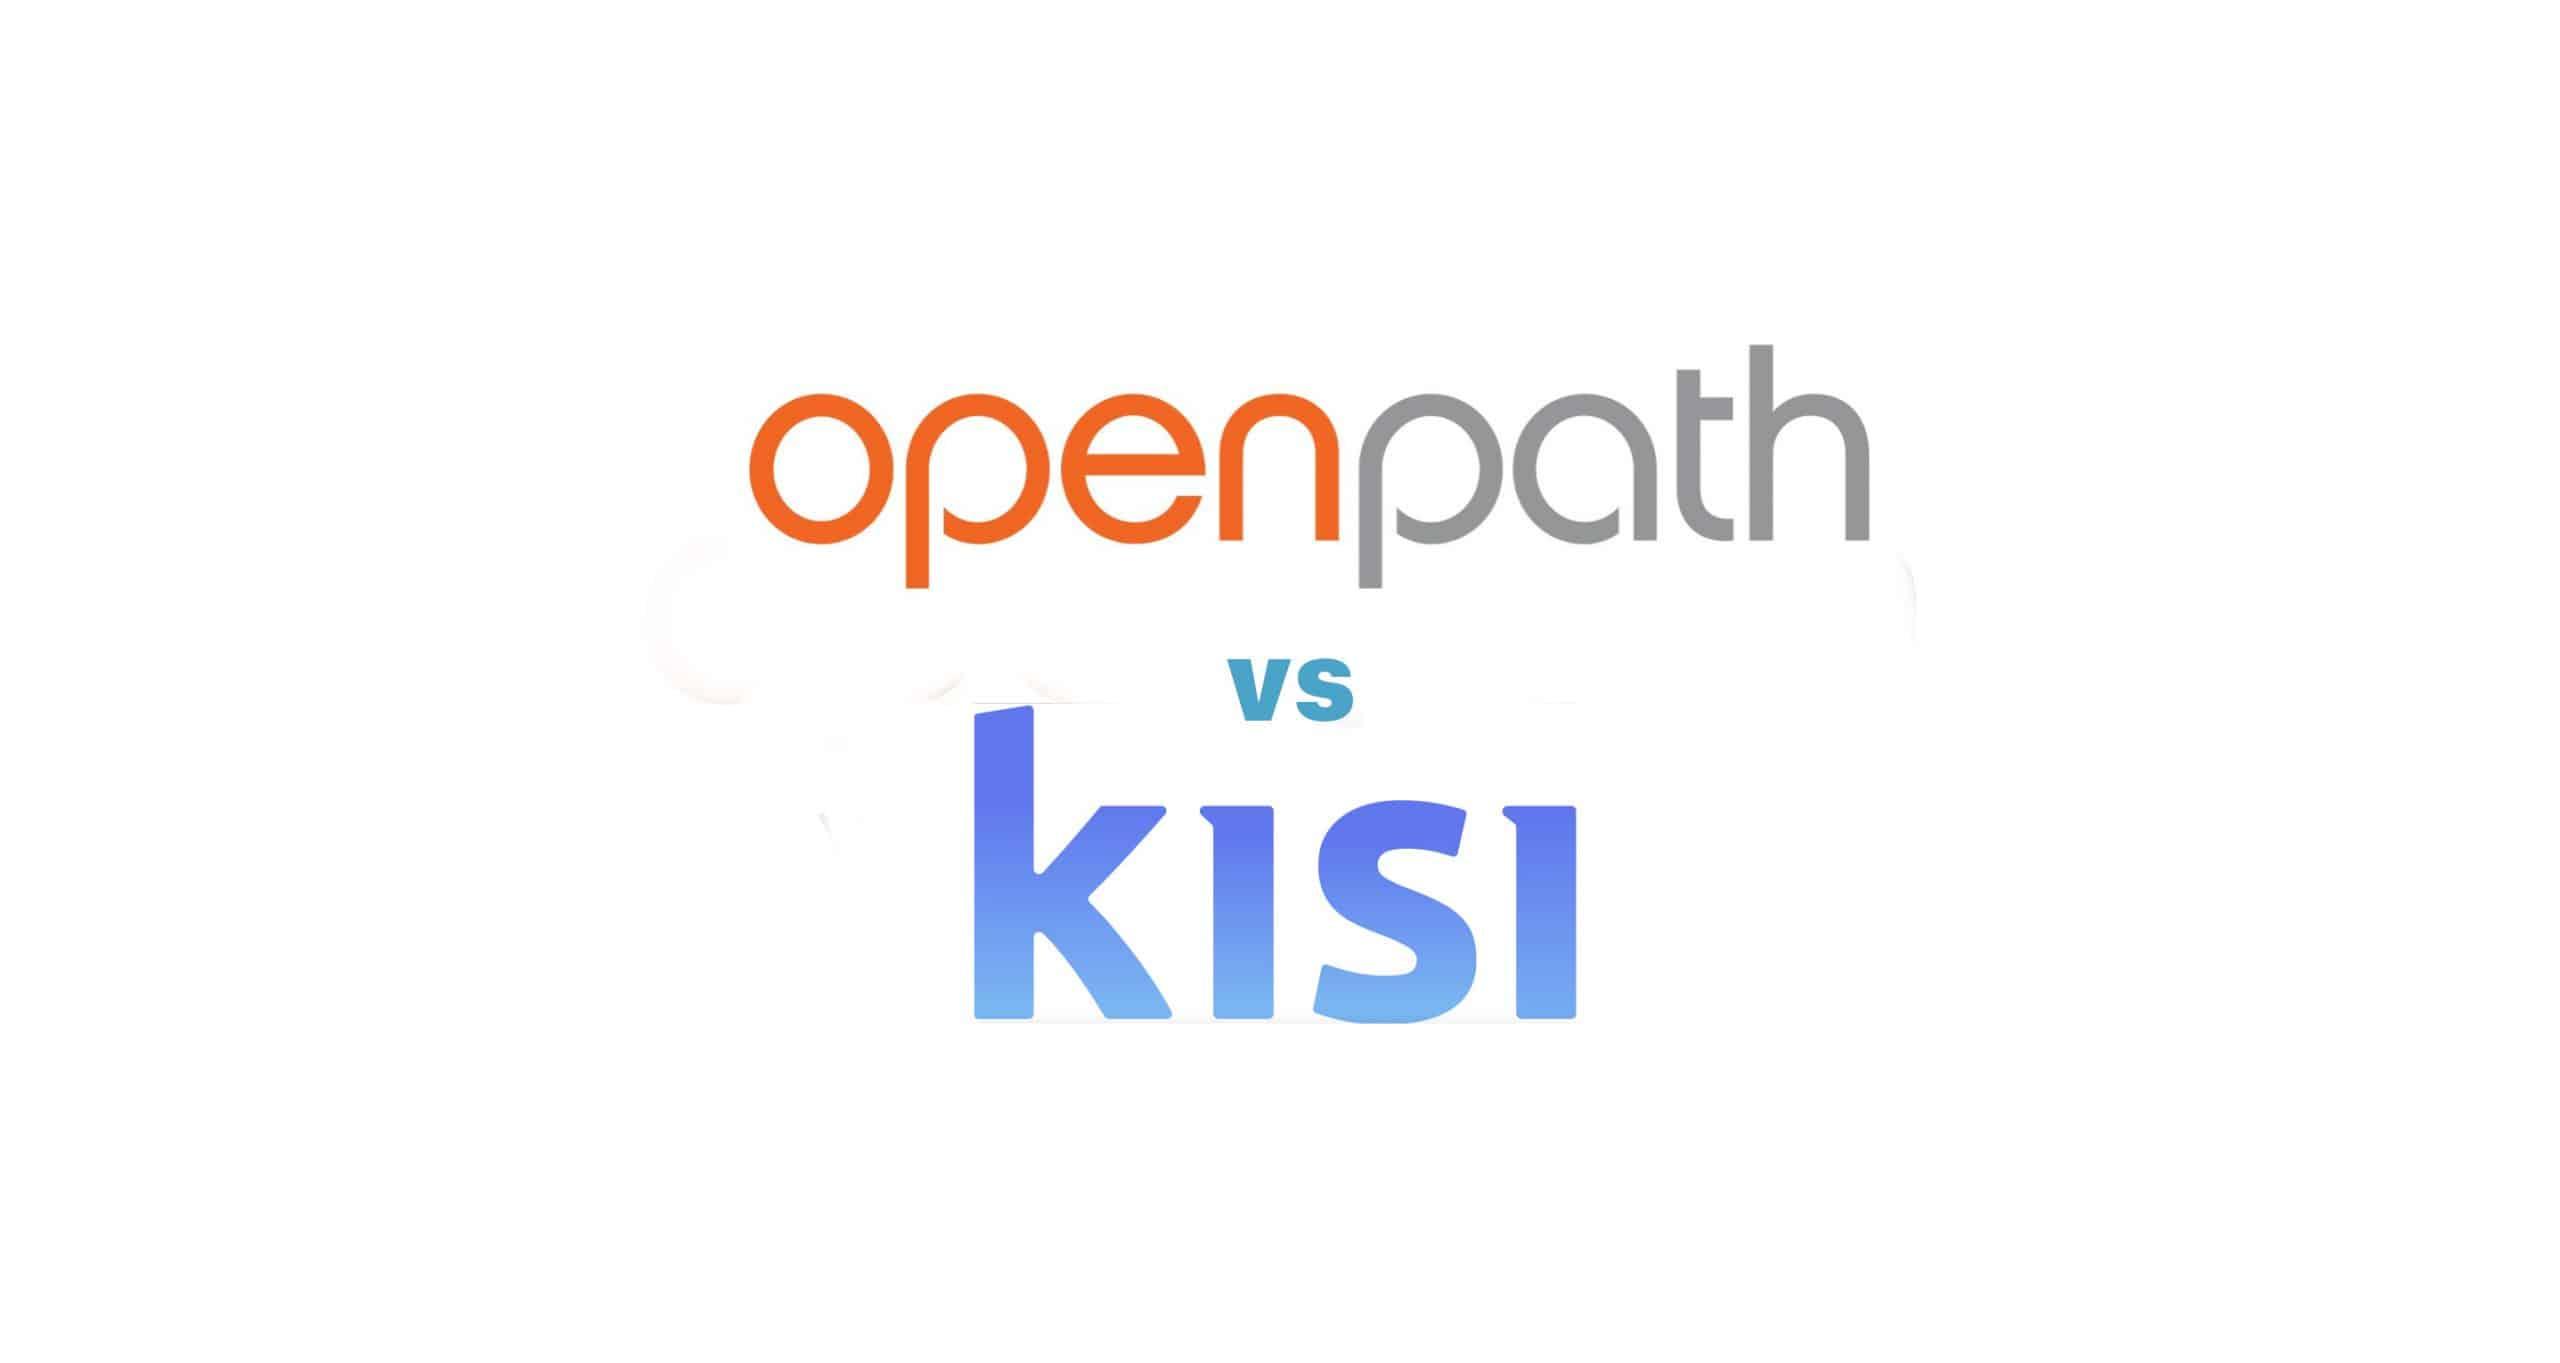 openpath vs kisi